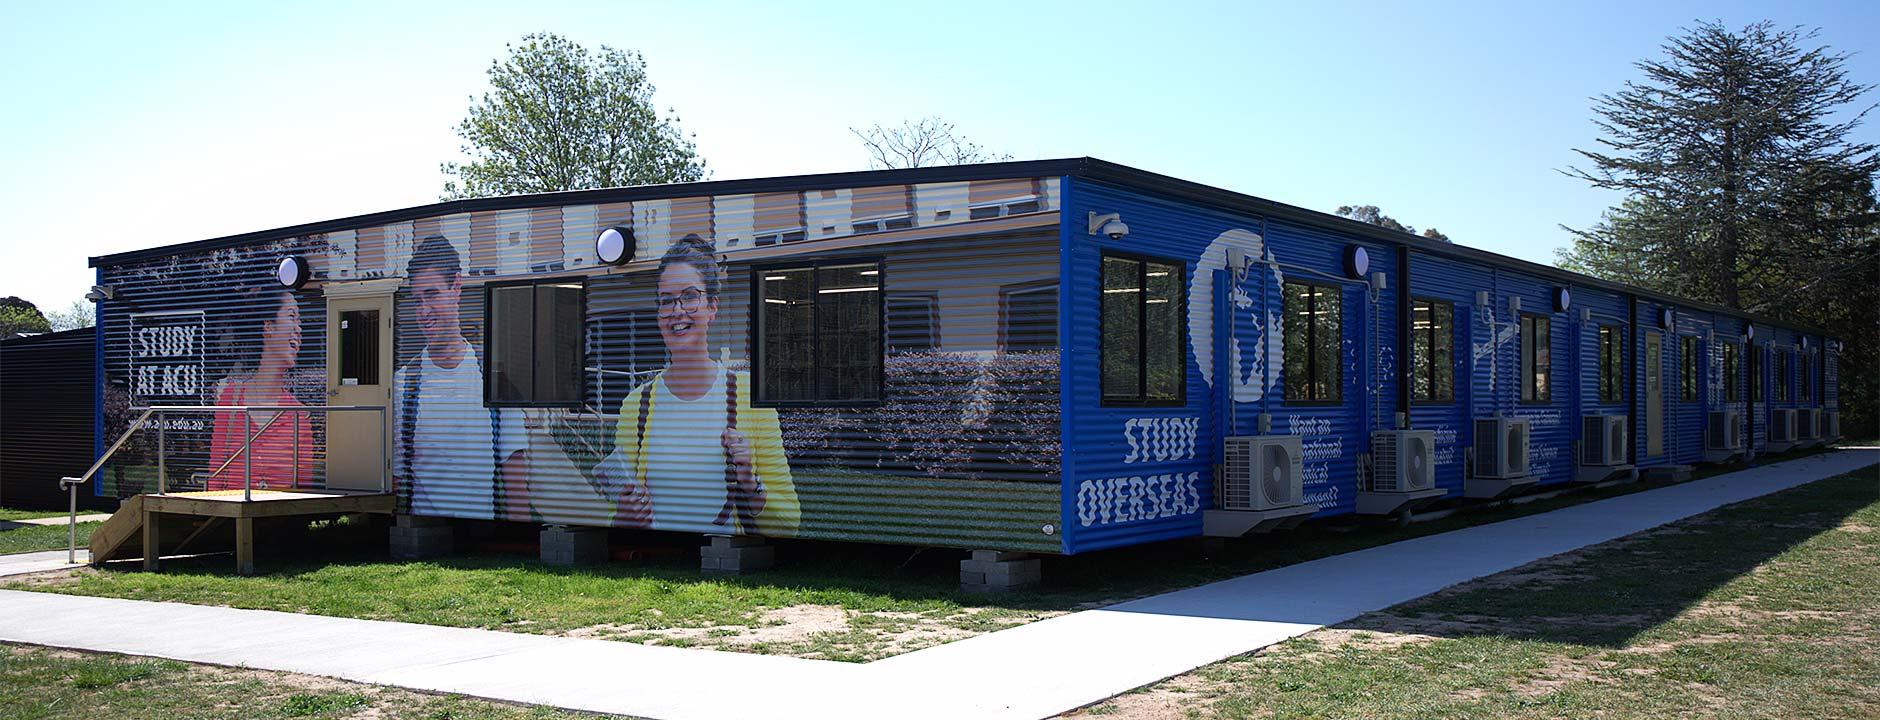 ACU Interim Library Facility, Antill St, Canberra